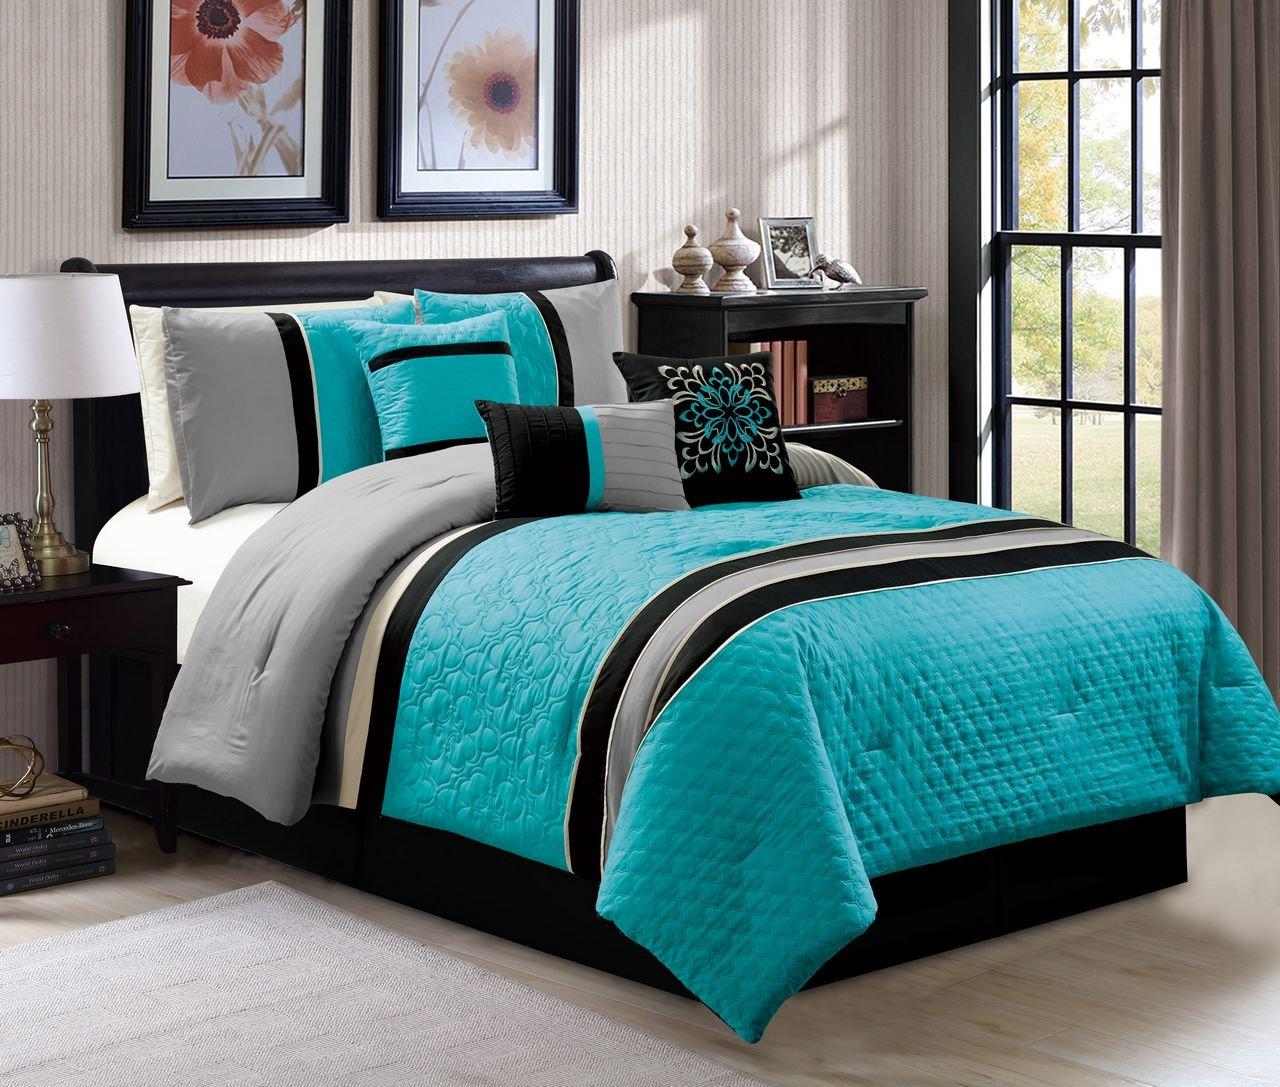 7 pc queen size quartrefoil quilted blue gray black comforter set bed in a bag ebay. Black Bedroom Furniture Sets. Home Design Ideas